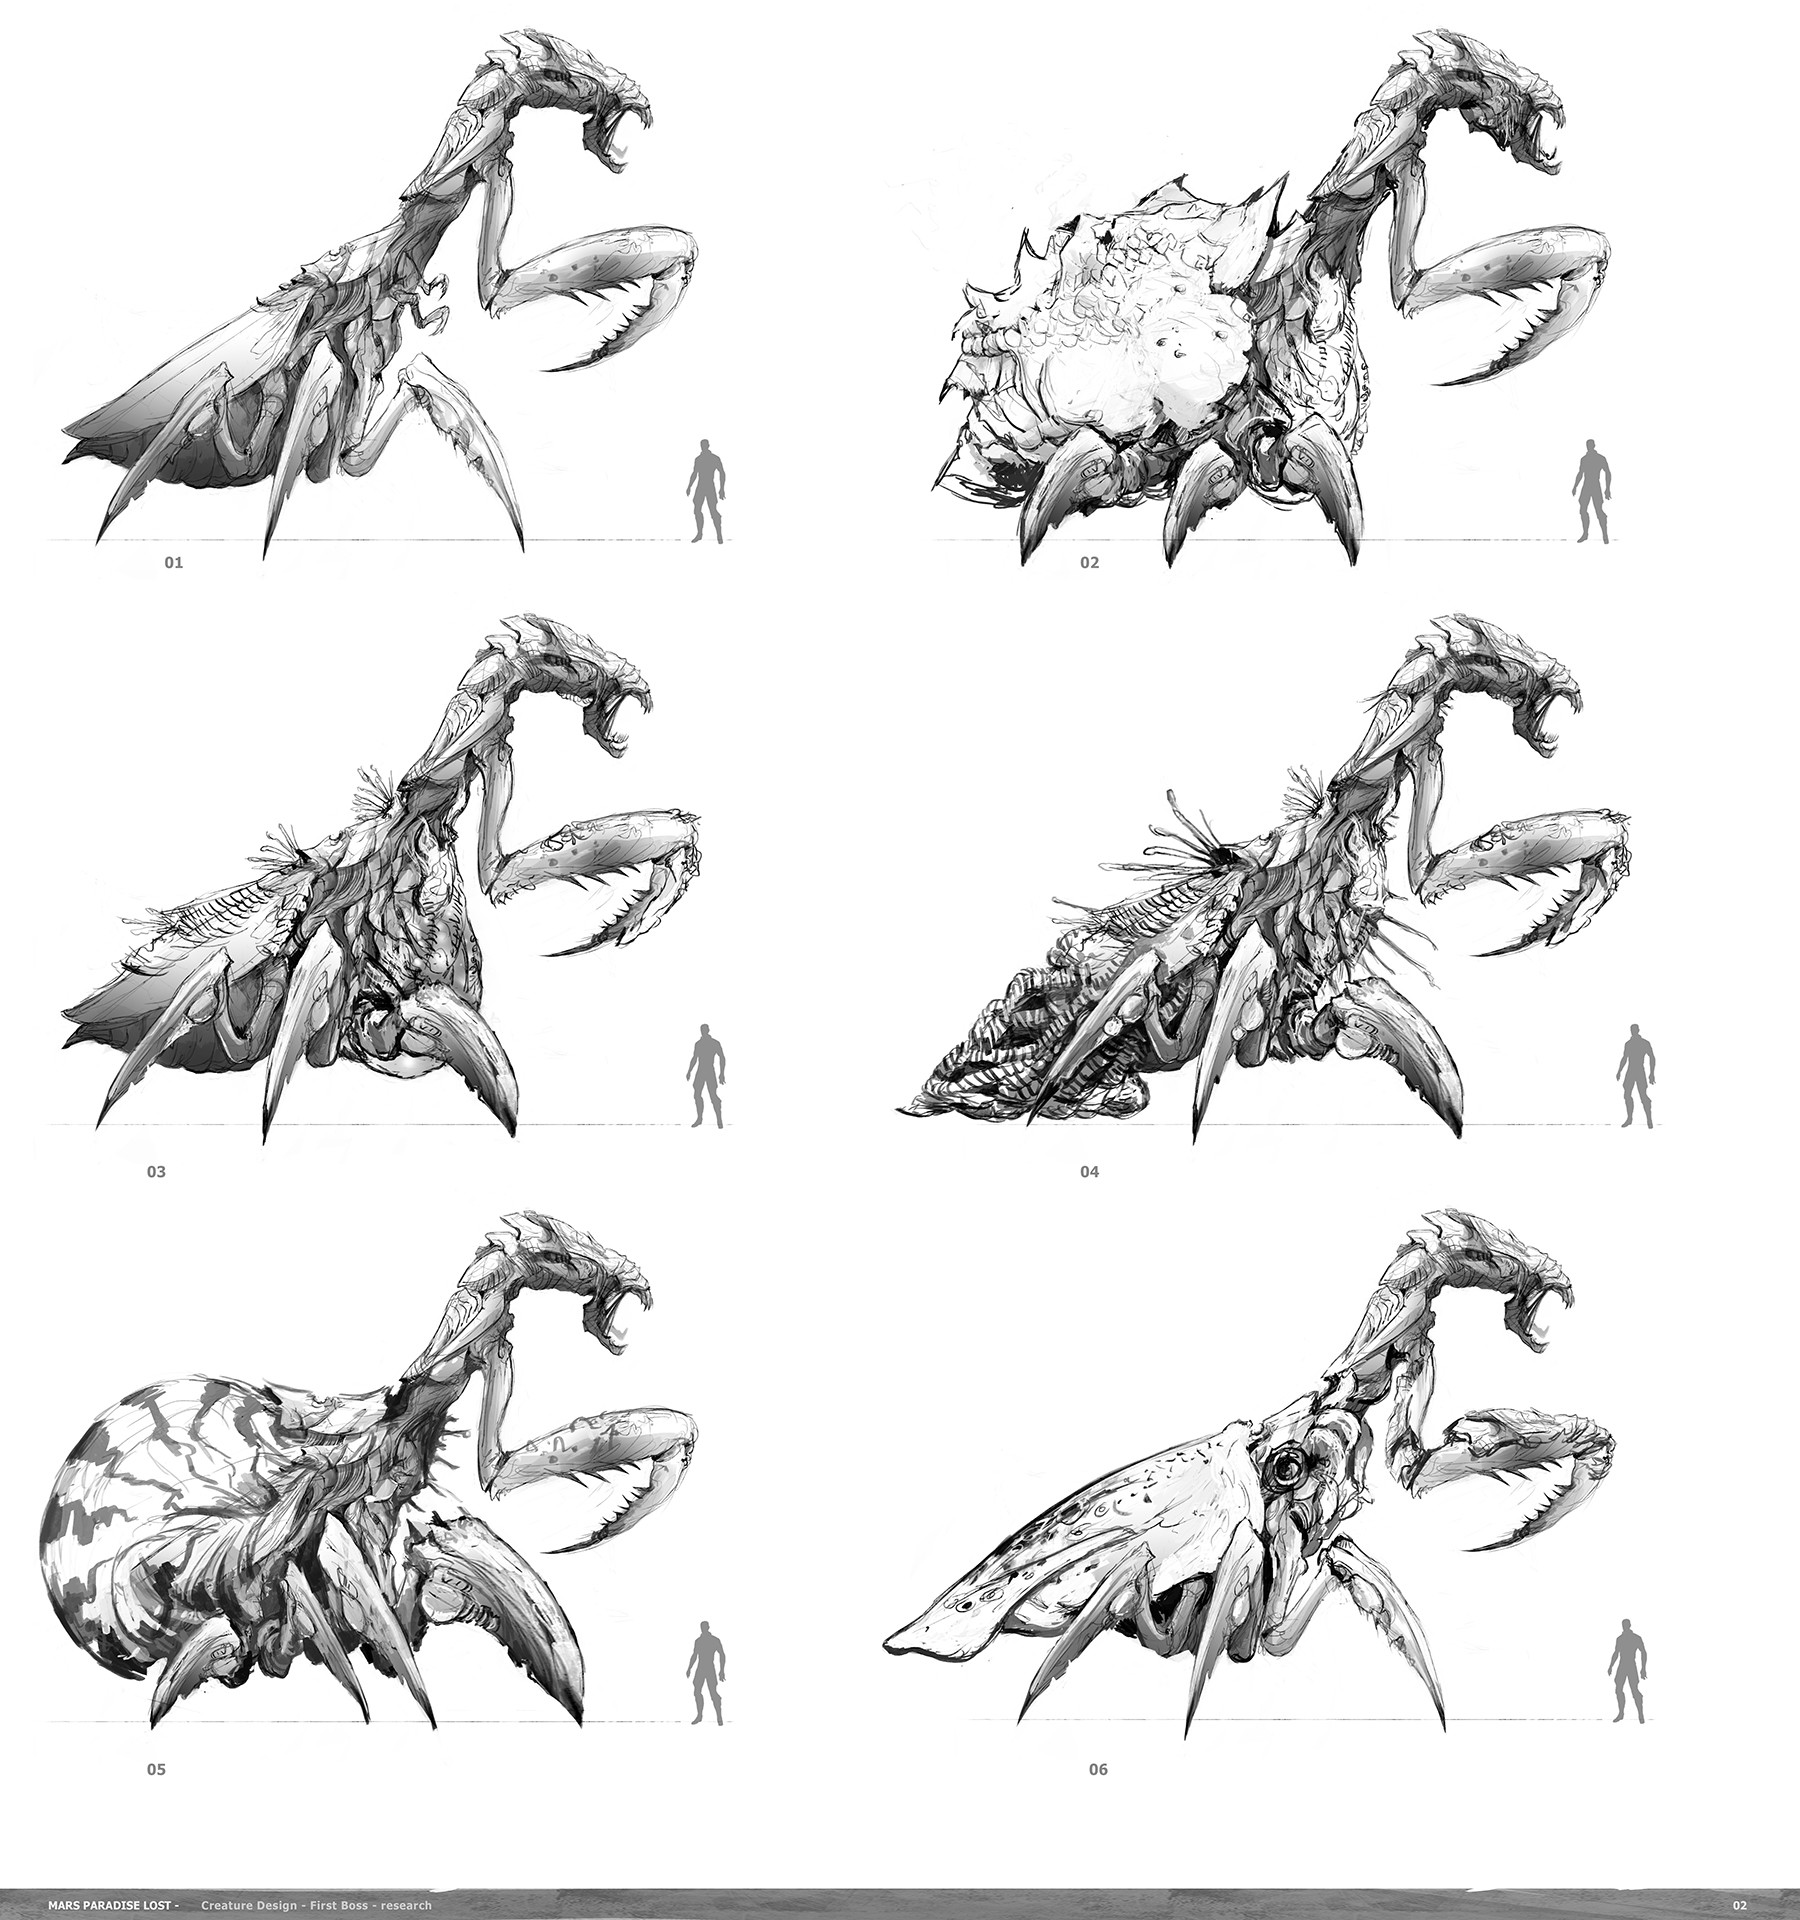 Alexandre chaudret mpl creature boss1 research02